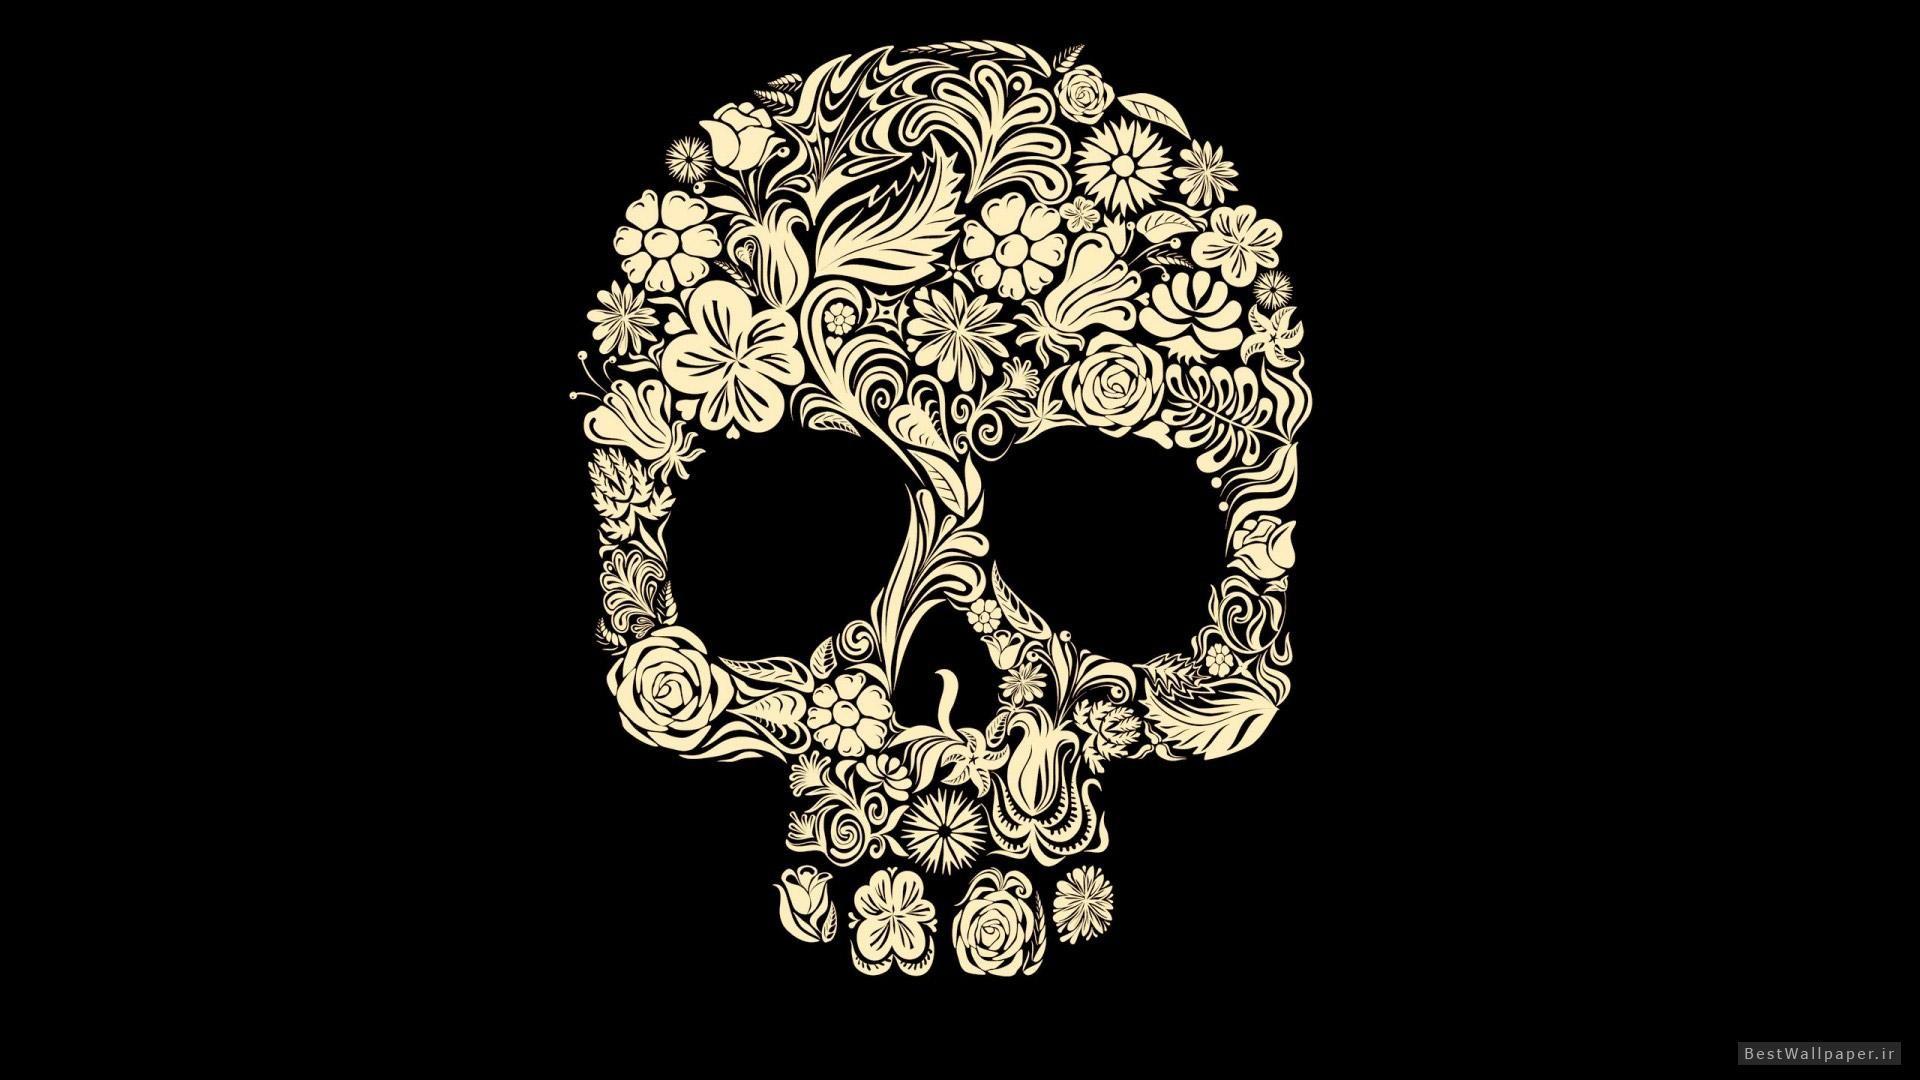 Cute Skeleton Wallpapers Free : Other Wallpaper – Kokean.com